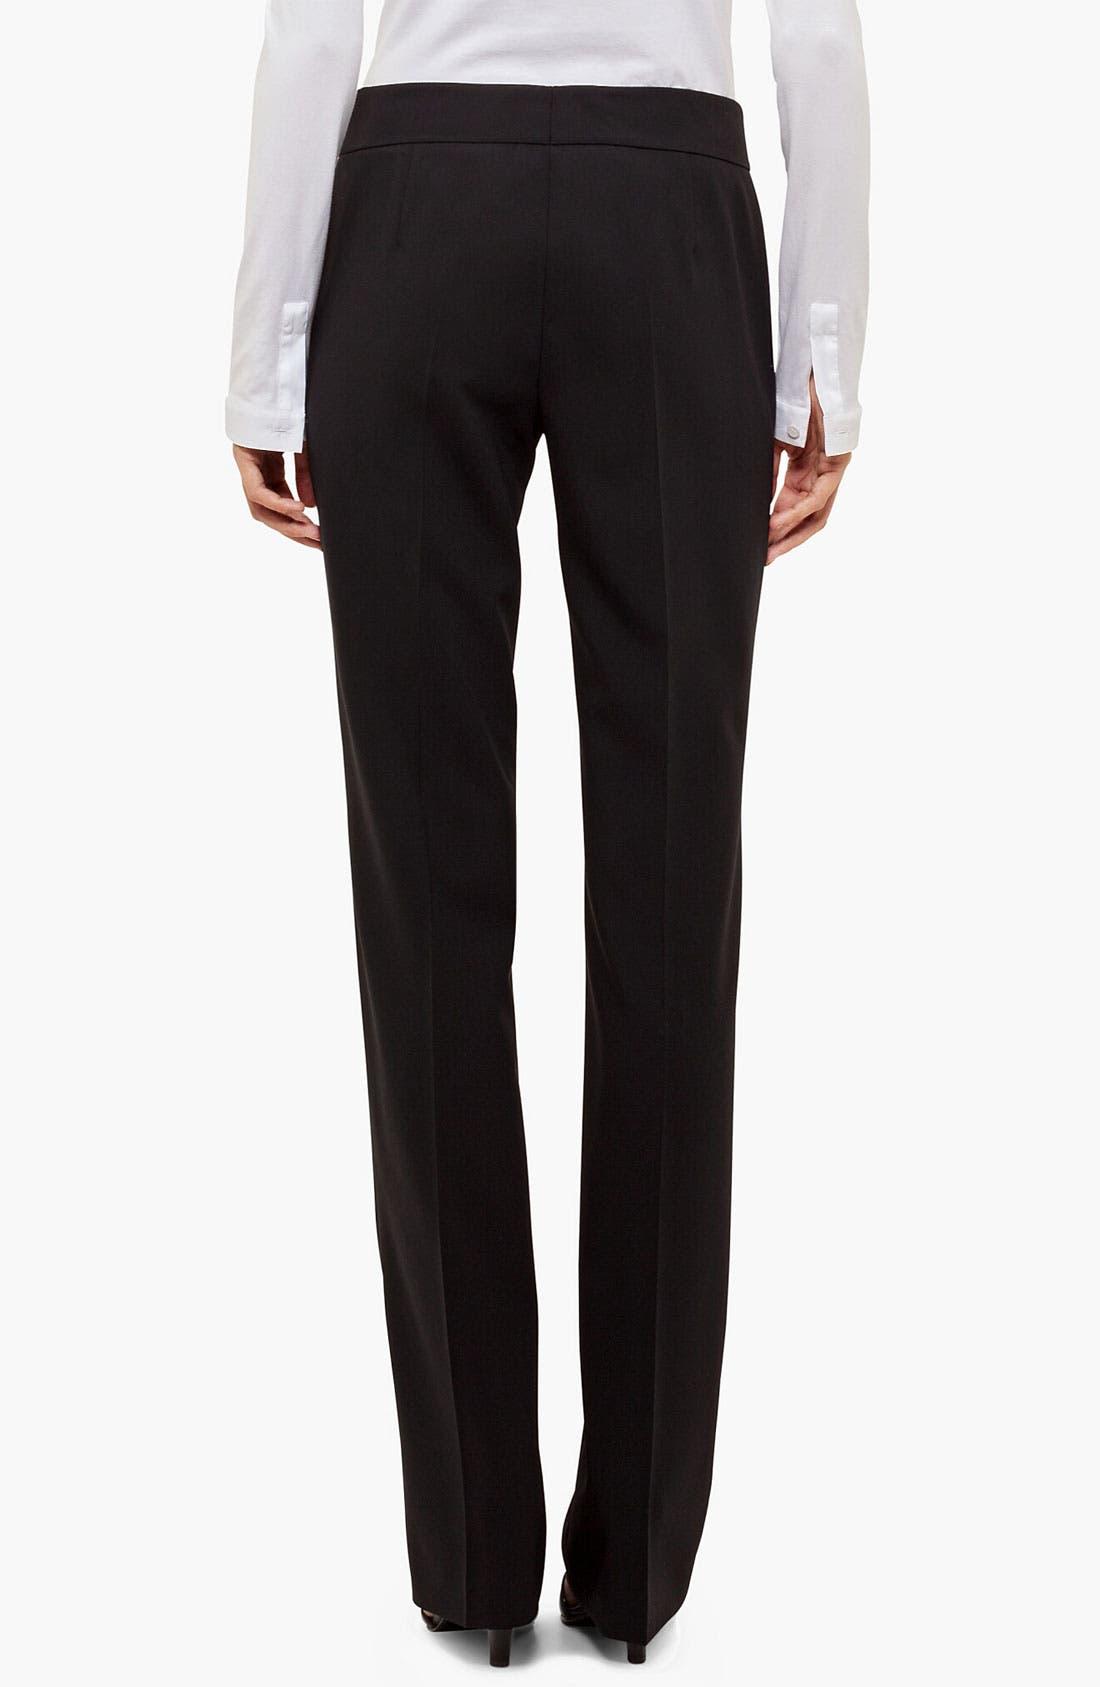 'Madison' Straight Leg Wool Trousers,                             Alternate thumbnail 10, color,                             001